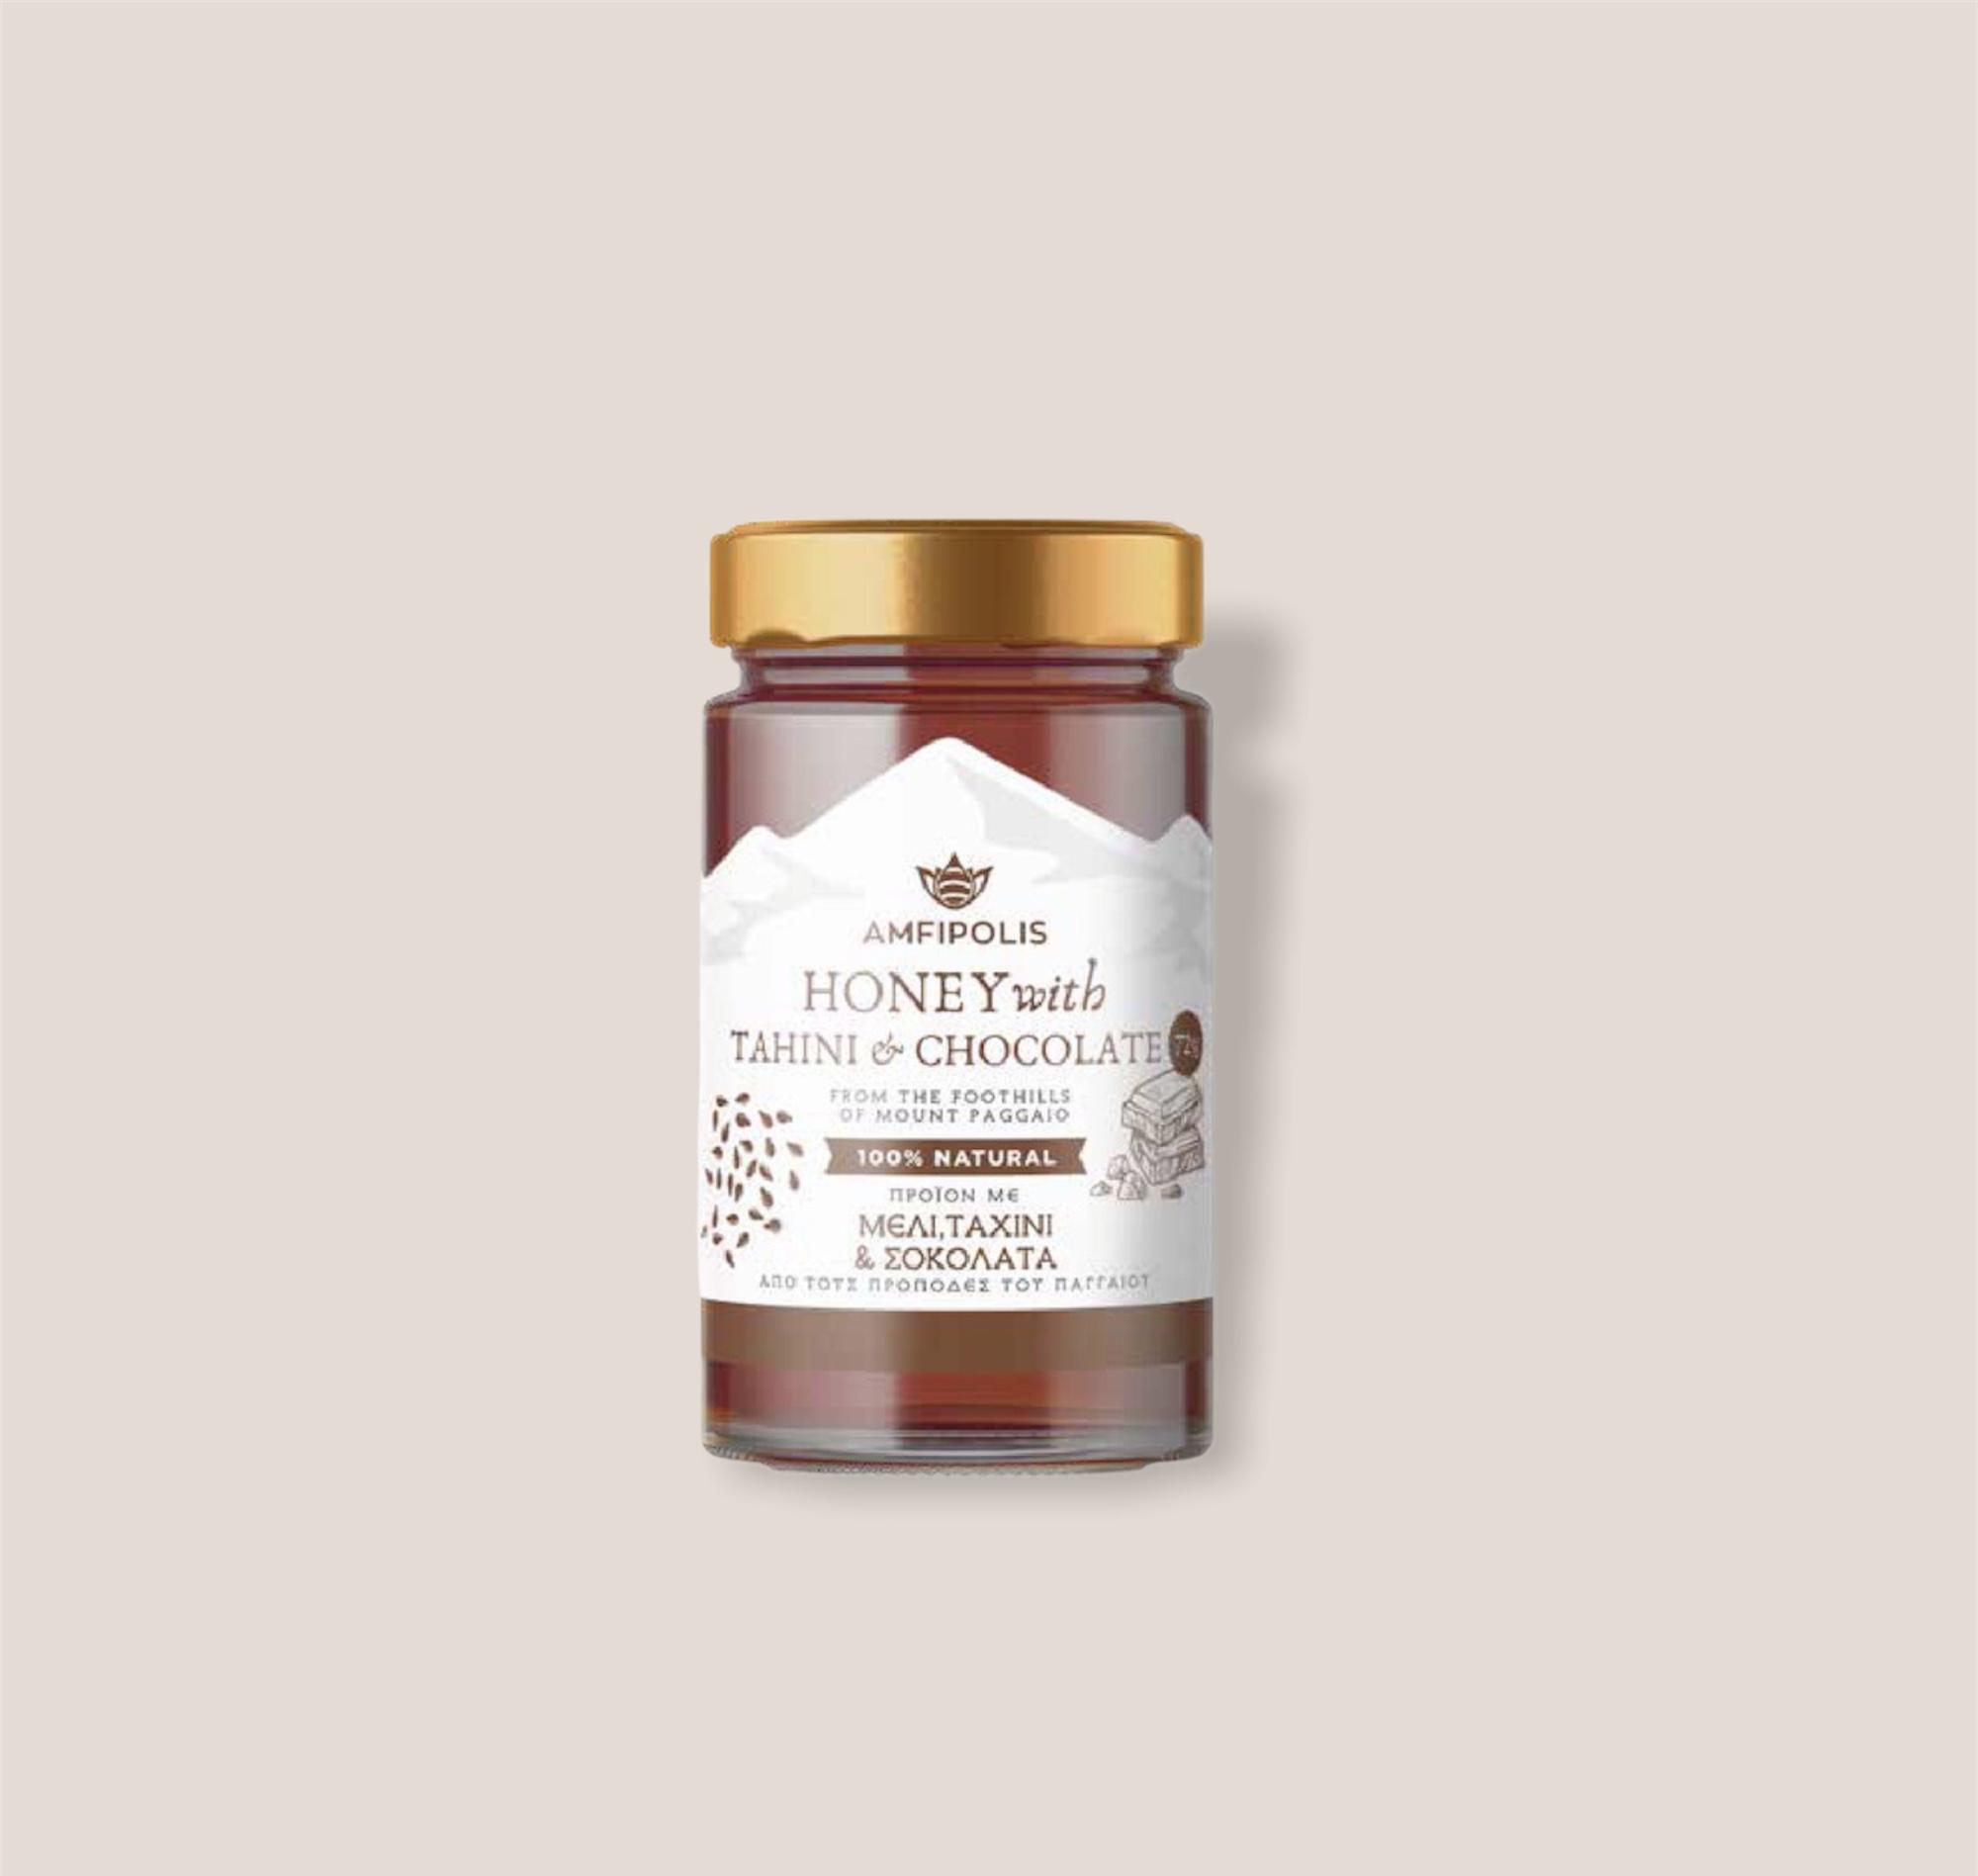 Amfipolis Honey with Tahini and Chocolate 350g